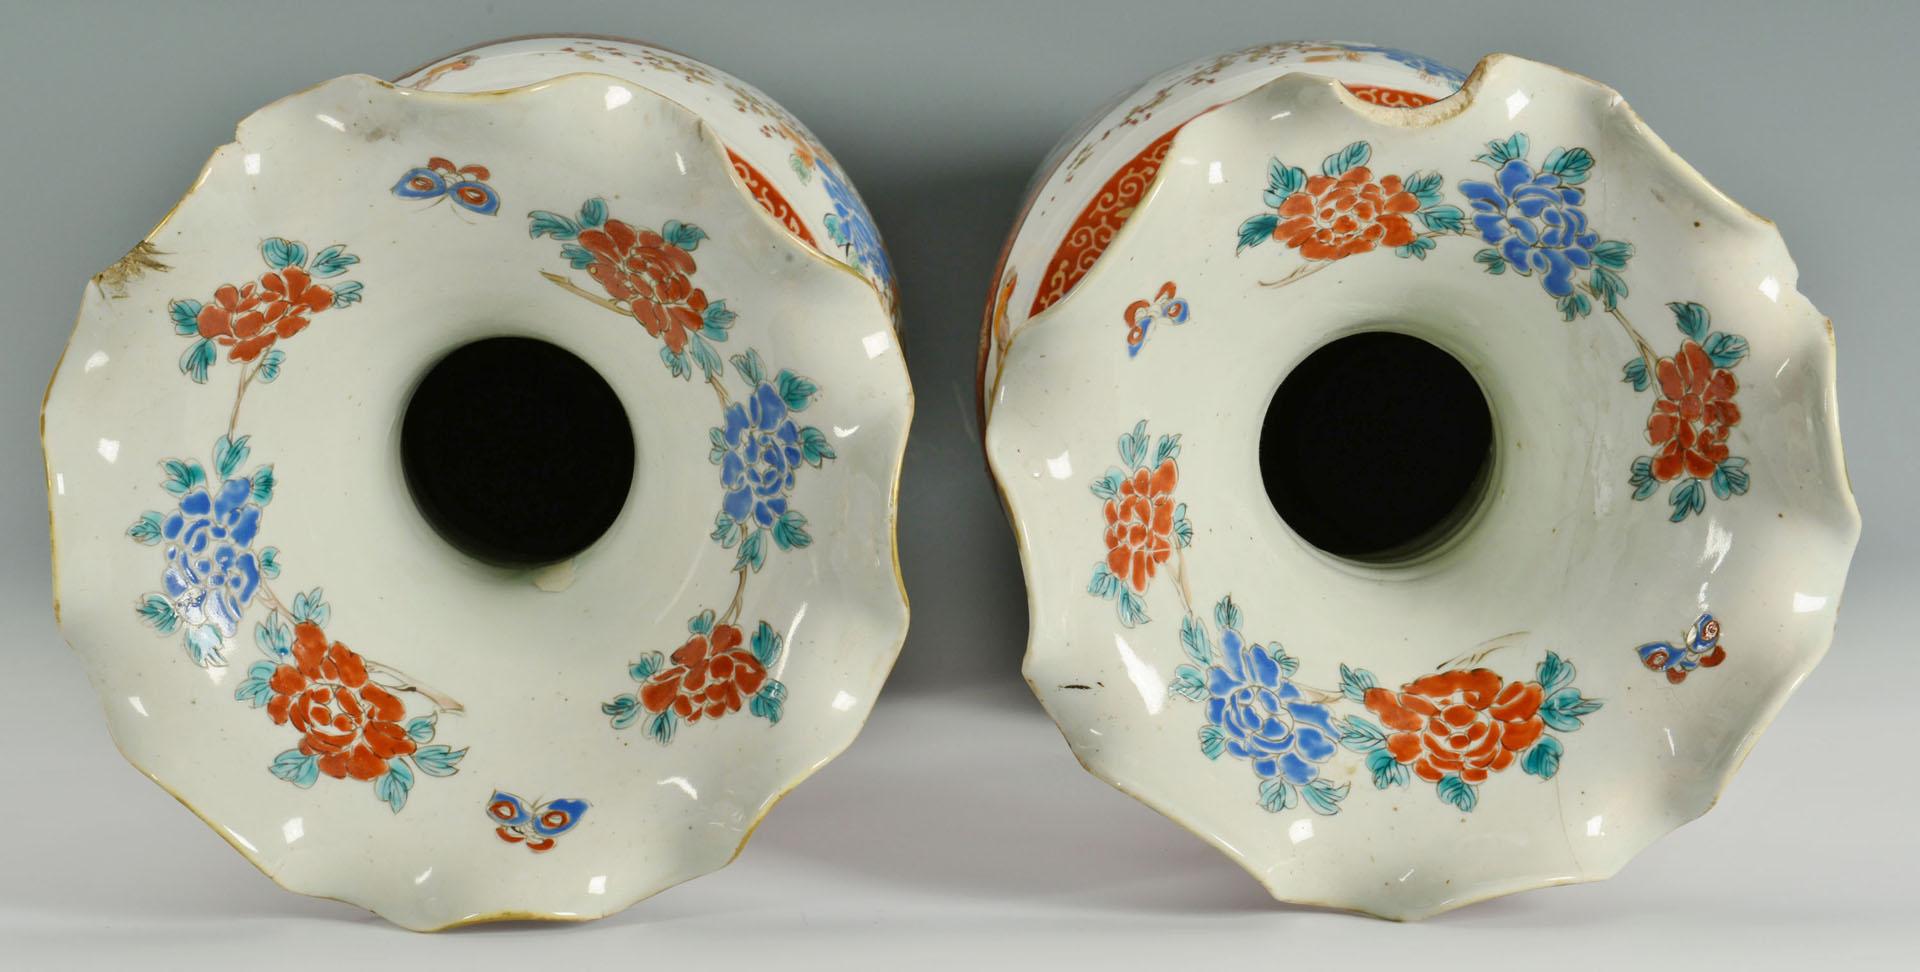 Lot 710: Pair Japanese Imari Porcelain Floor Vases